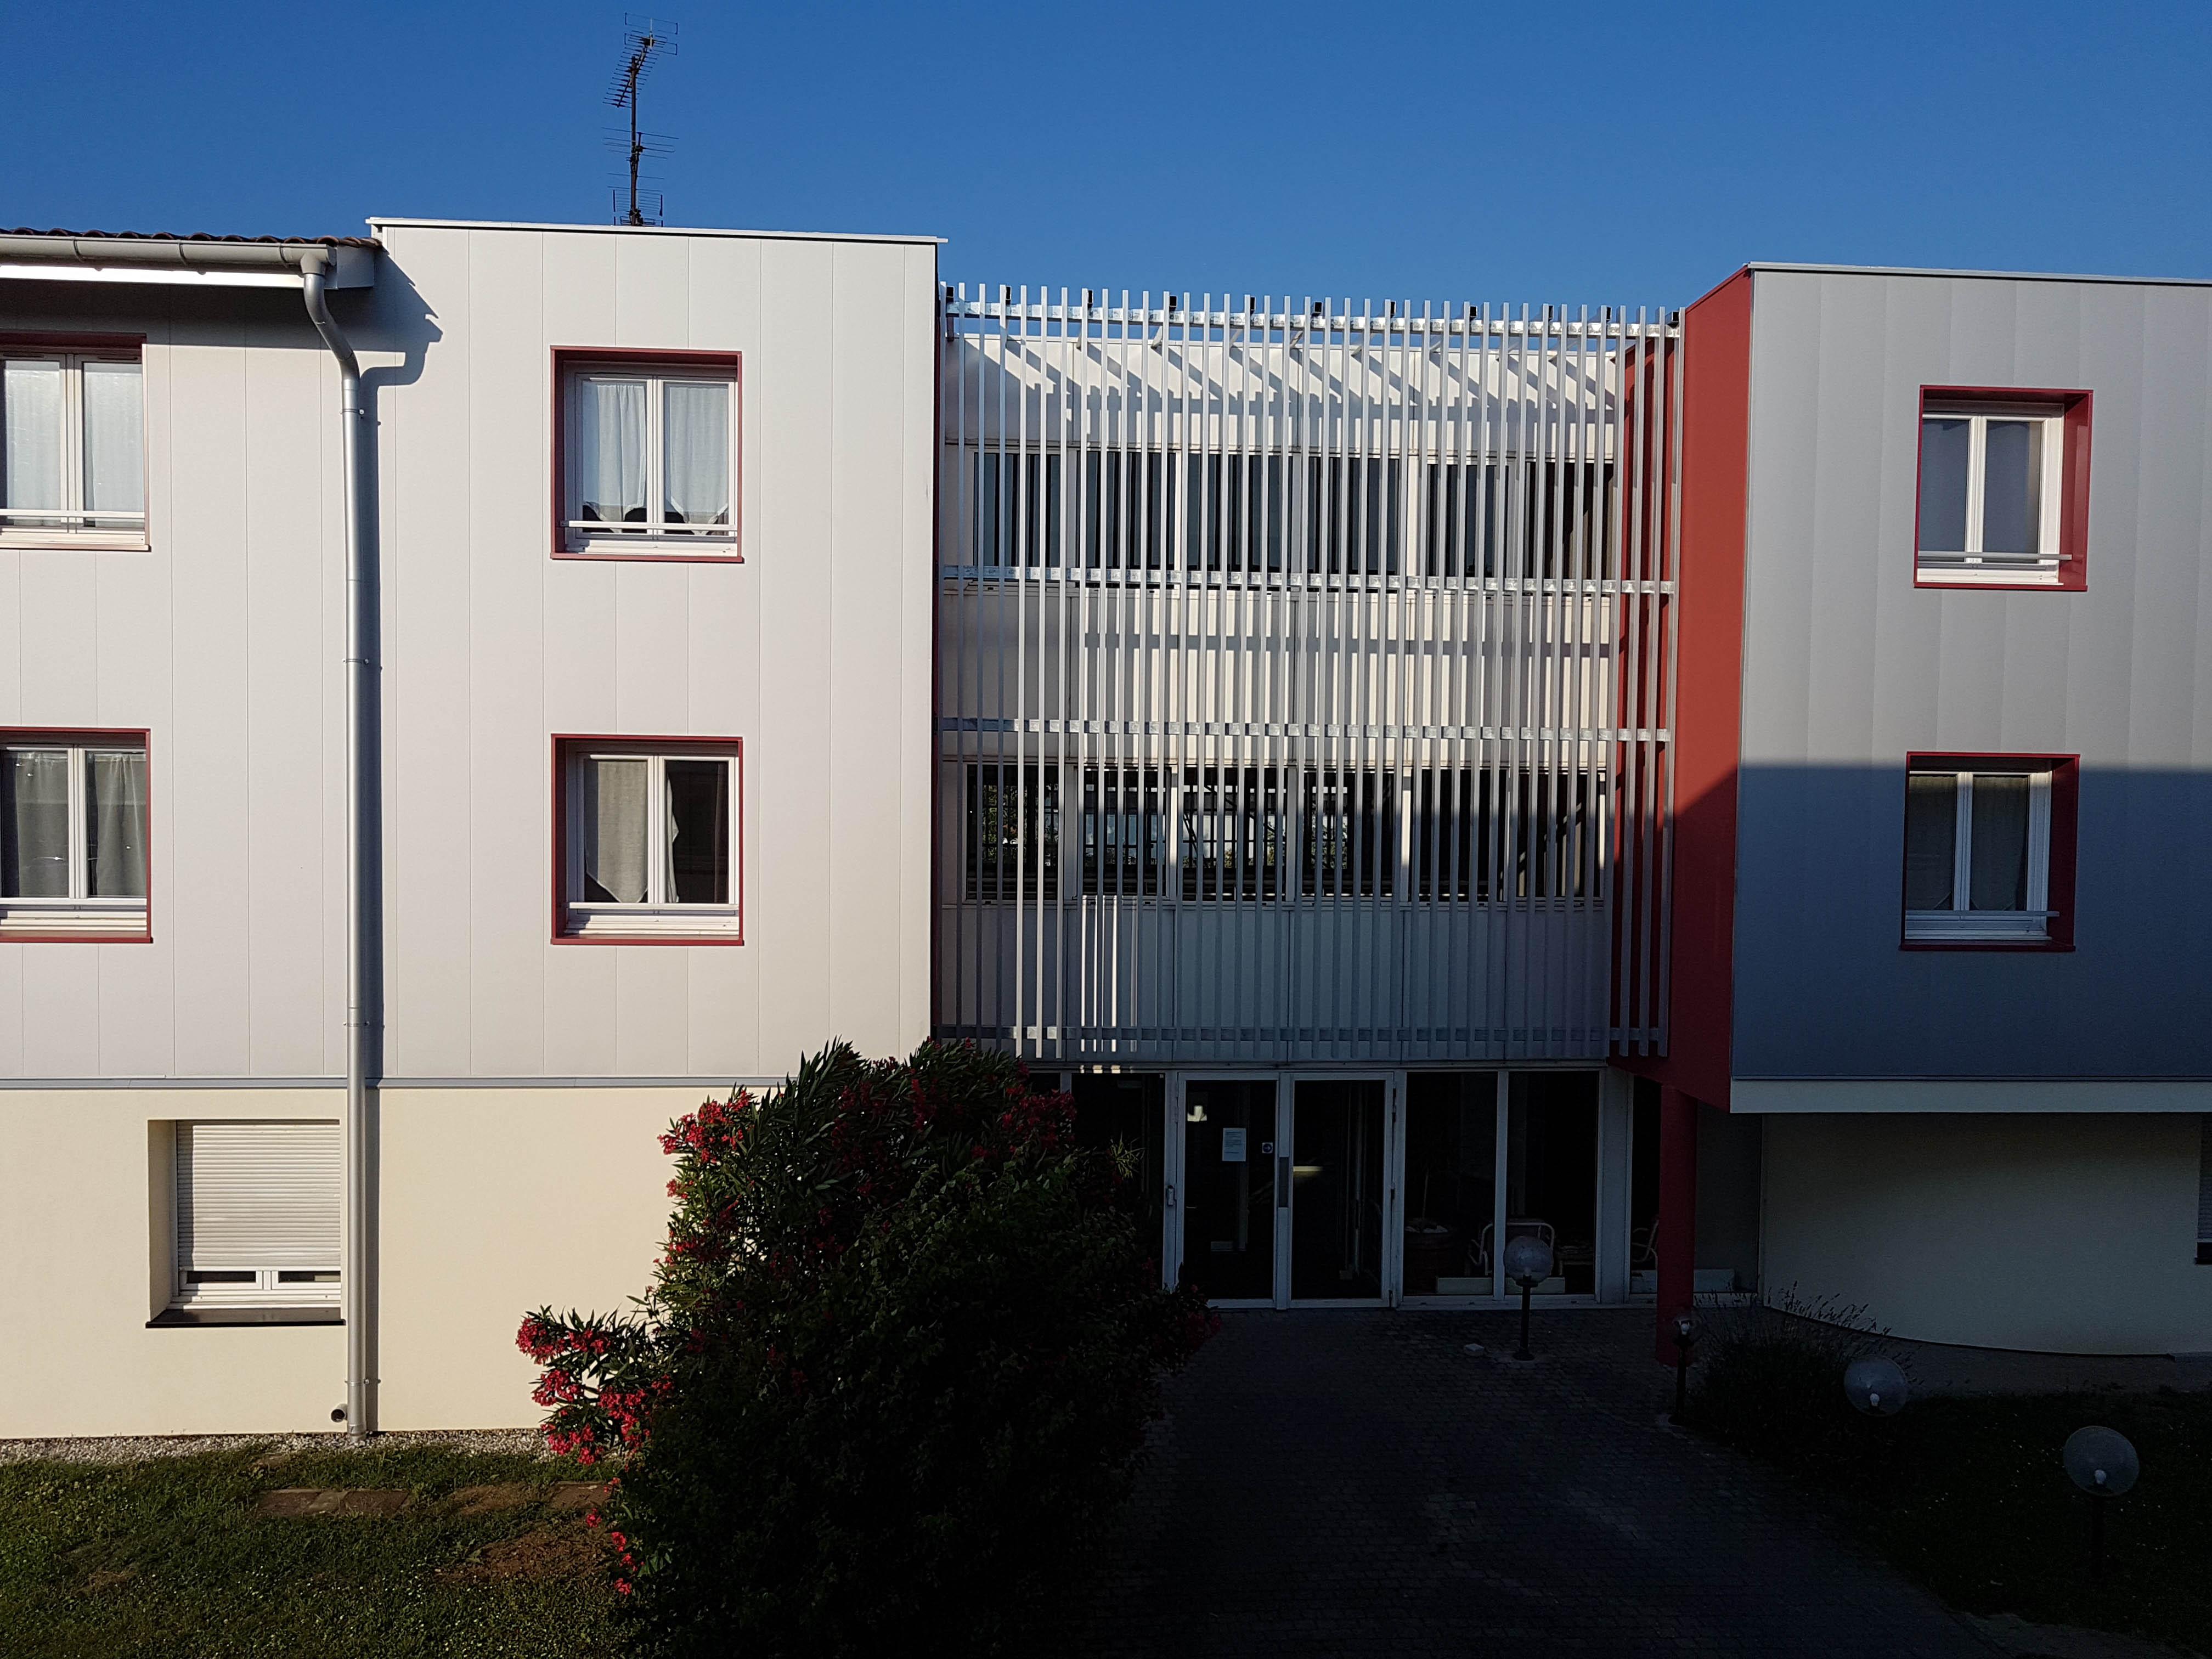 Location ABITEL - VILLENAVE D'ORNON - Villenave-d'Ornon (33140)